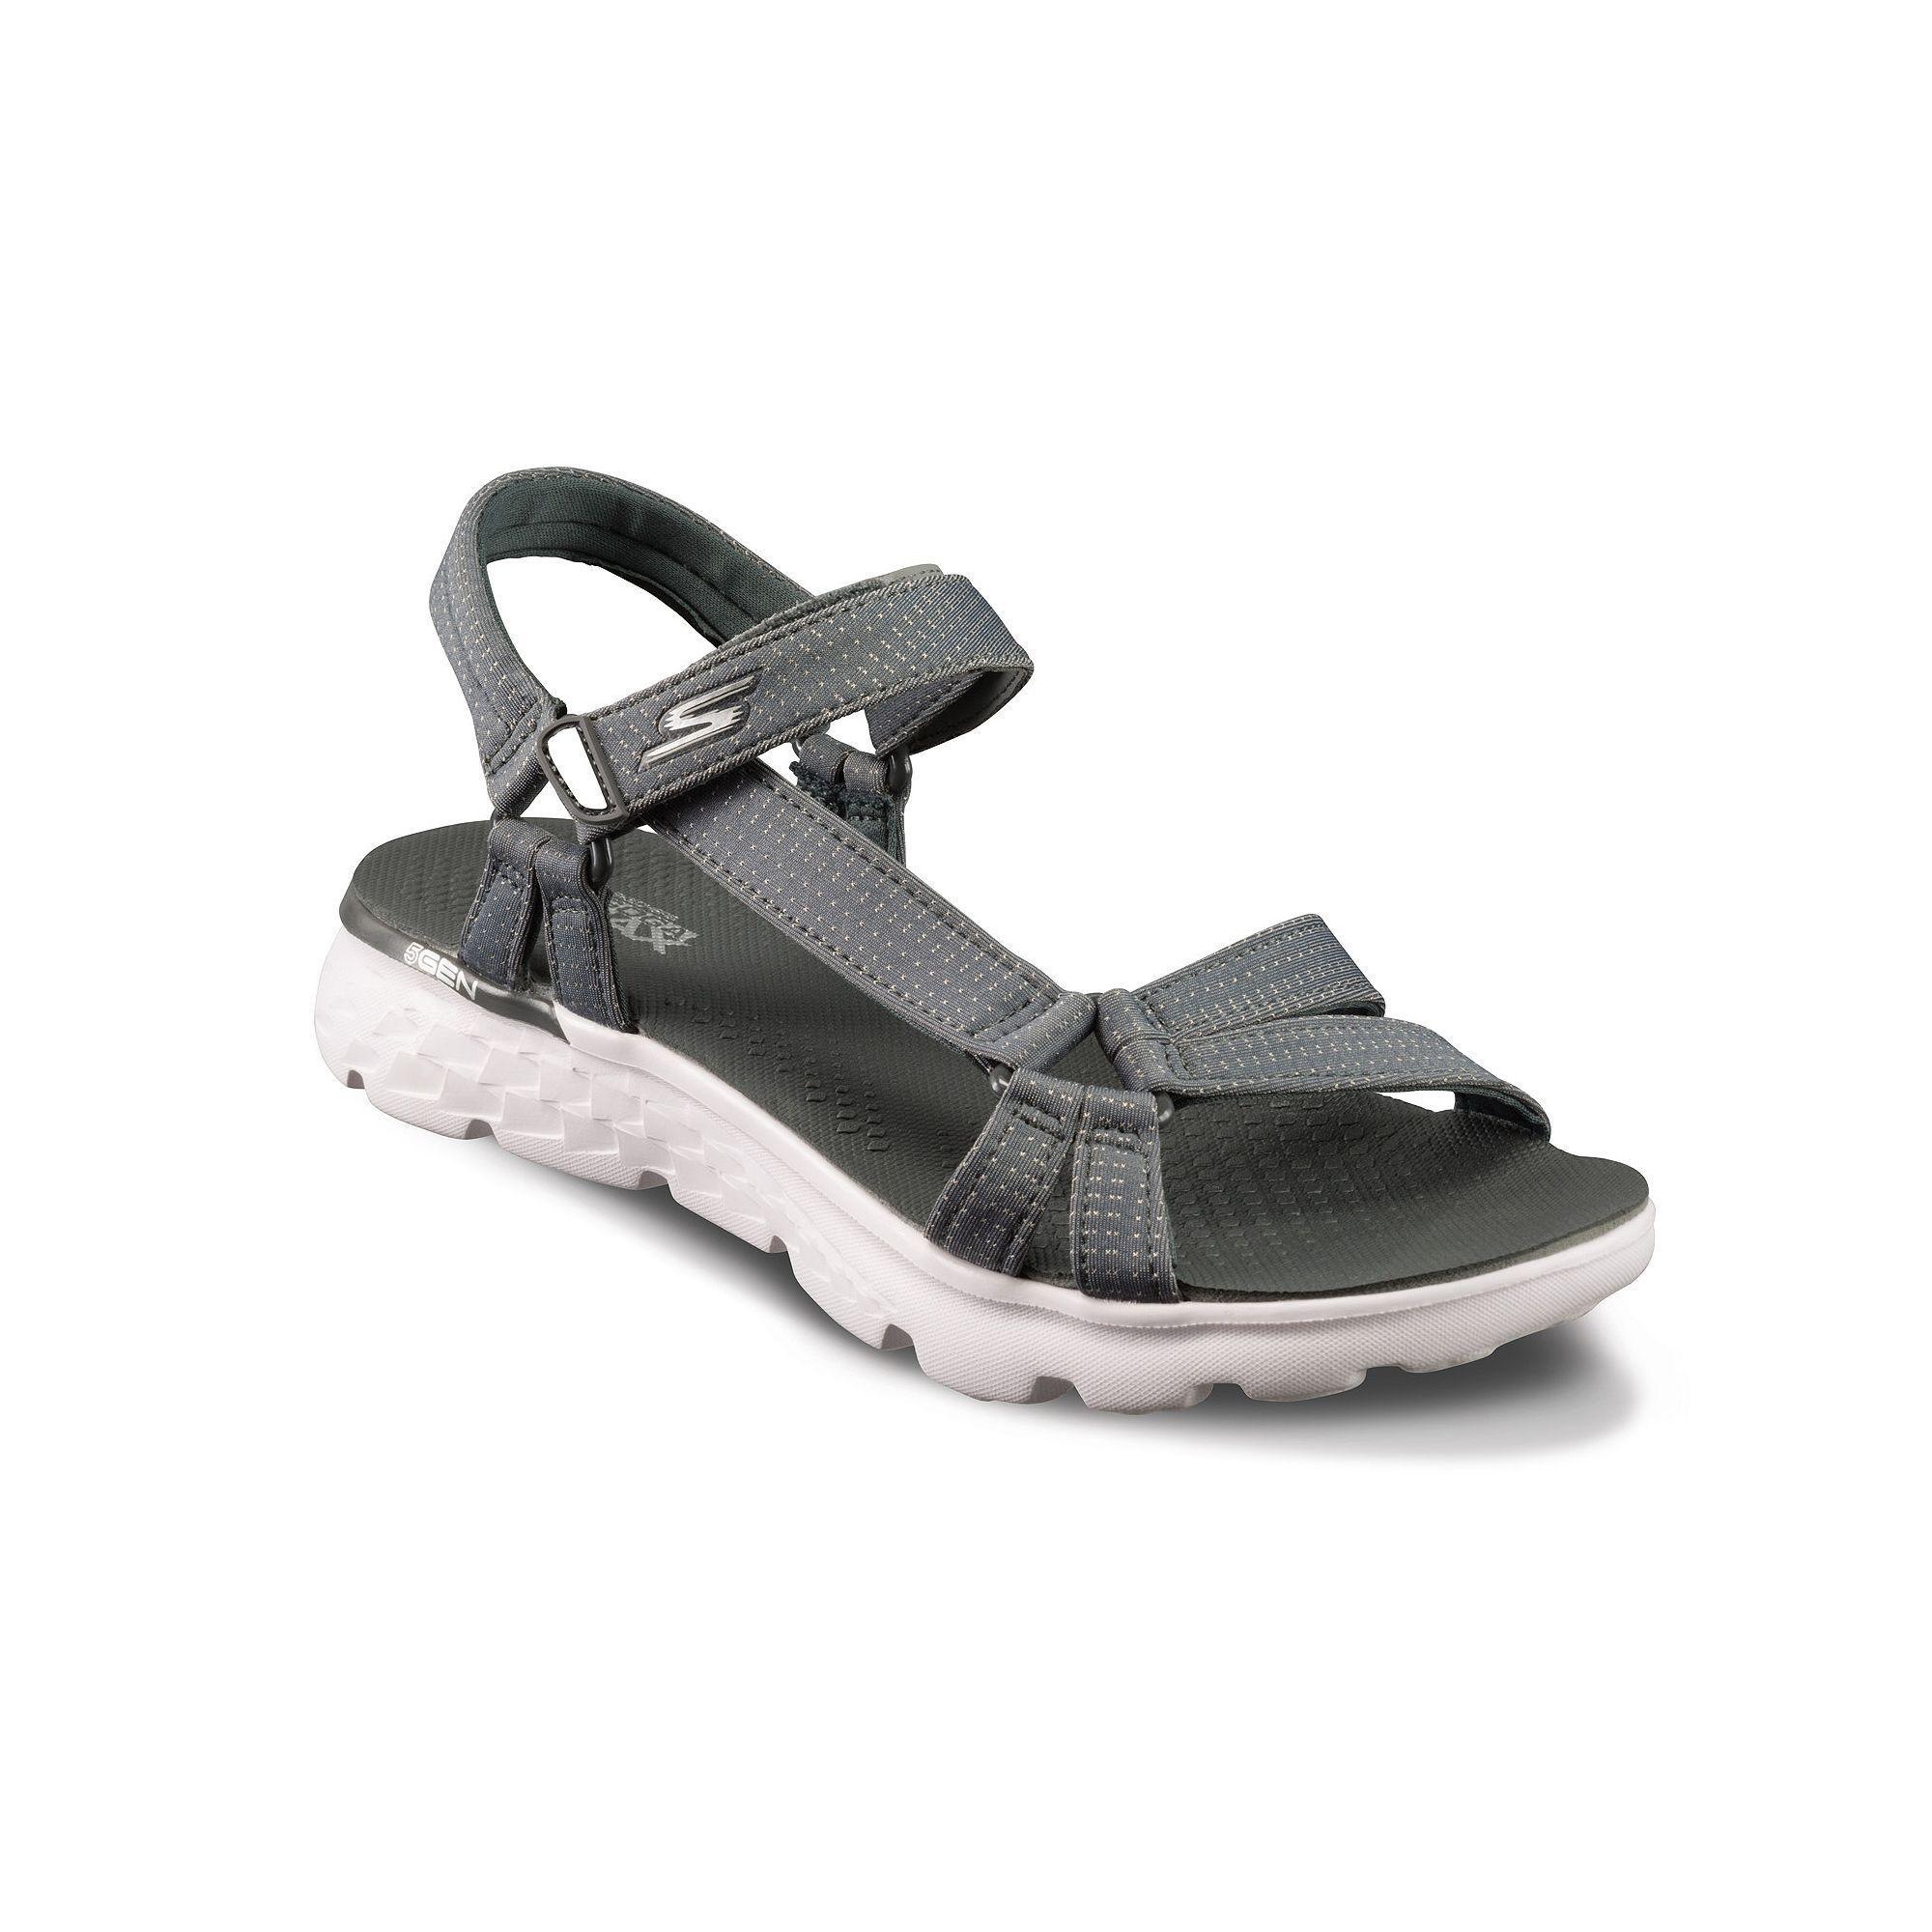 8cfb8e604aef Skechers On-The-GO 400 Radiance Women s Sandals